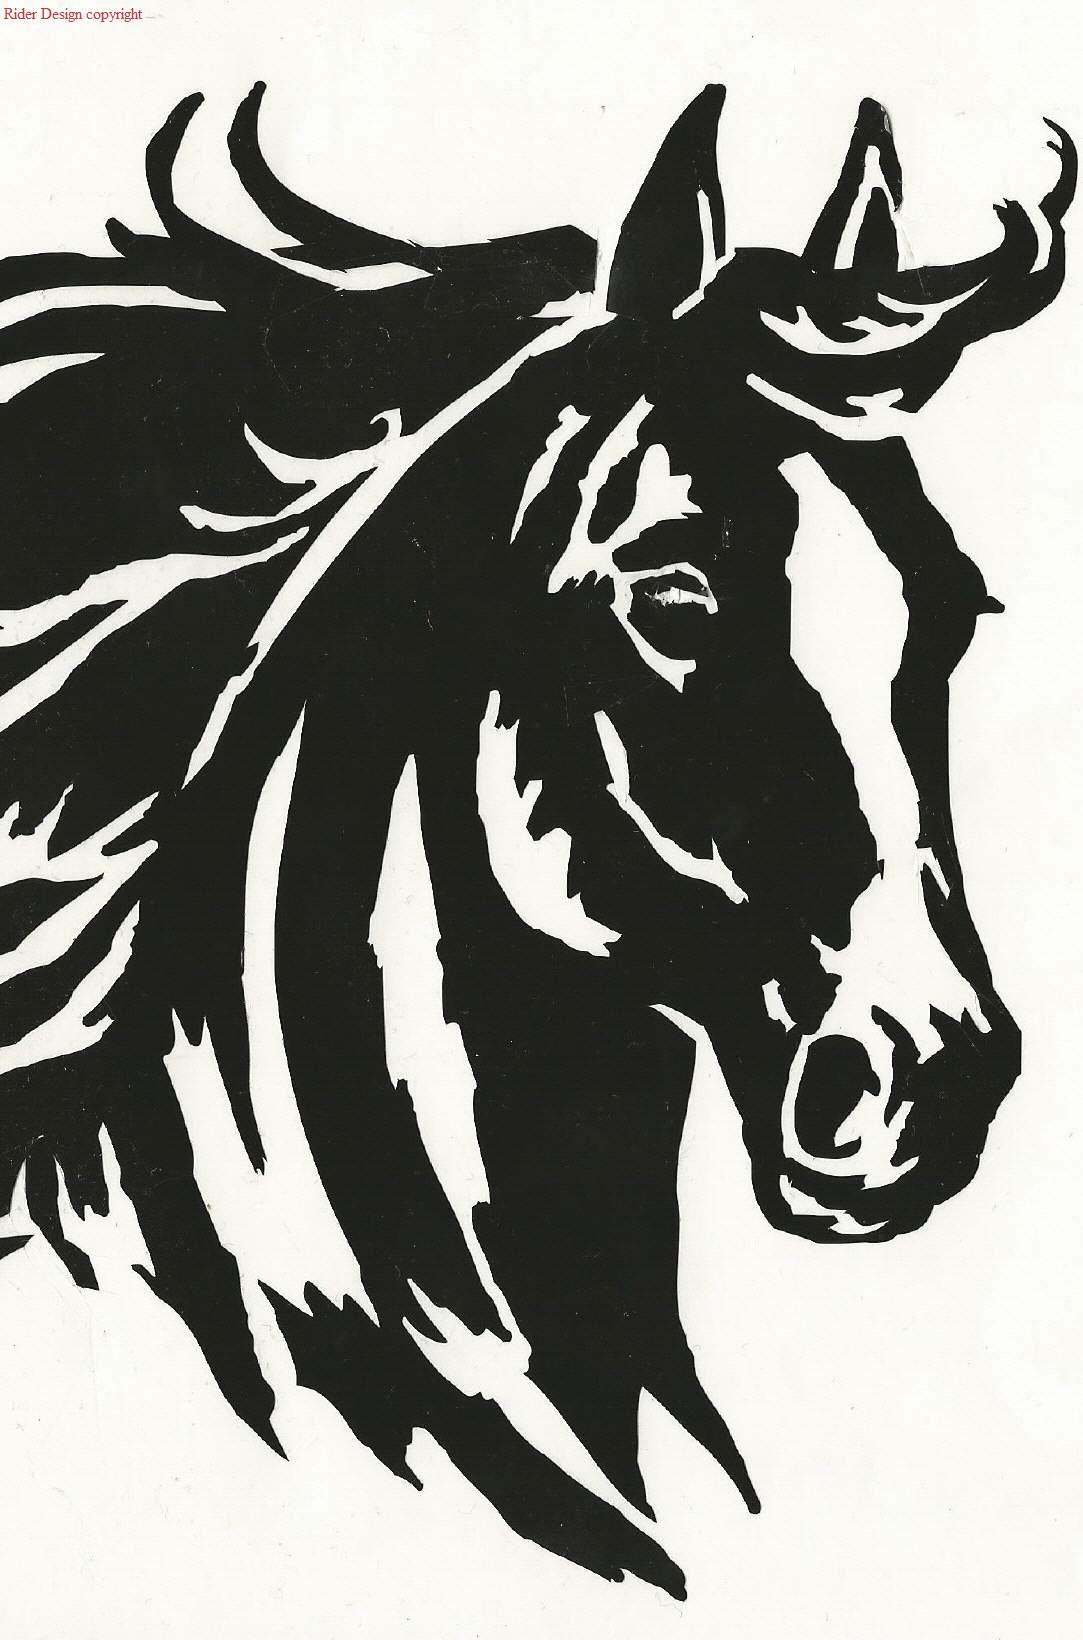 pferdeaufkleber f r autos aufkleber mit pferden. Black Bedroom Furniture Sets. Home Design Ideas